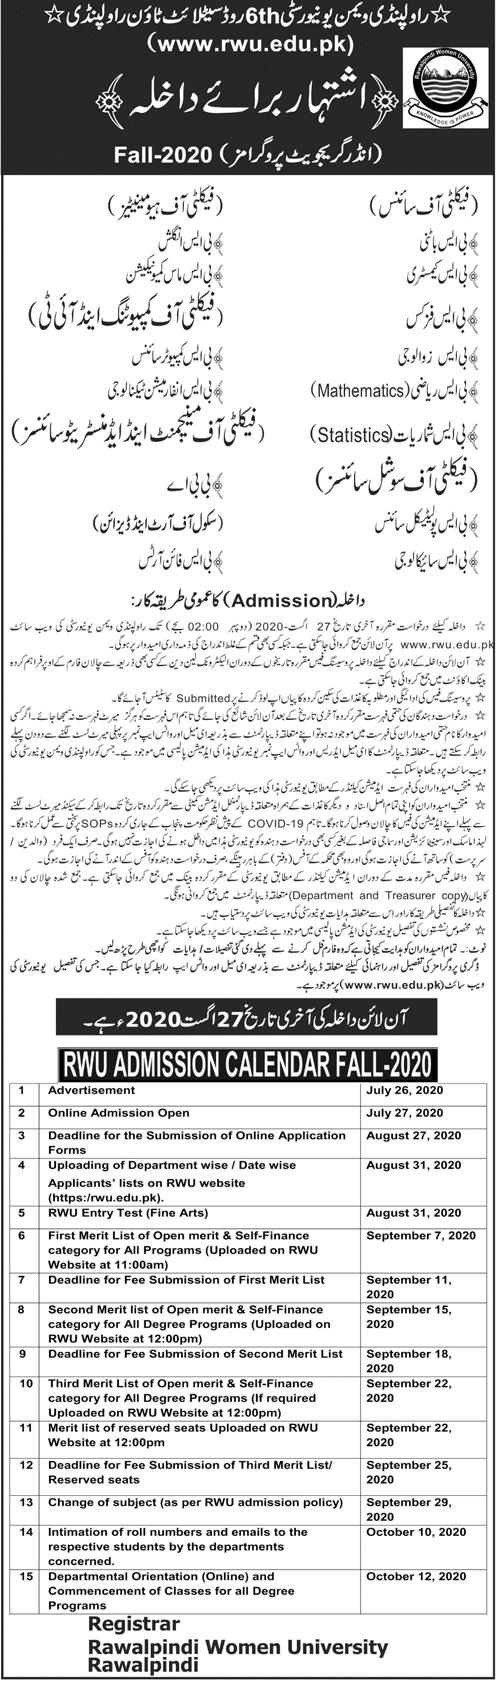 Rawalpindi Women University Undergraduate Admission 2020